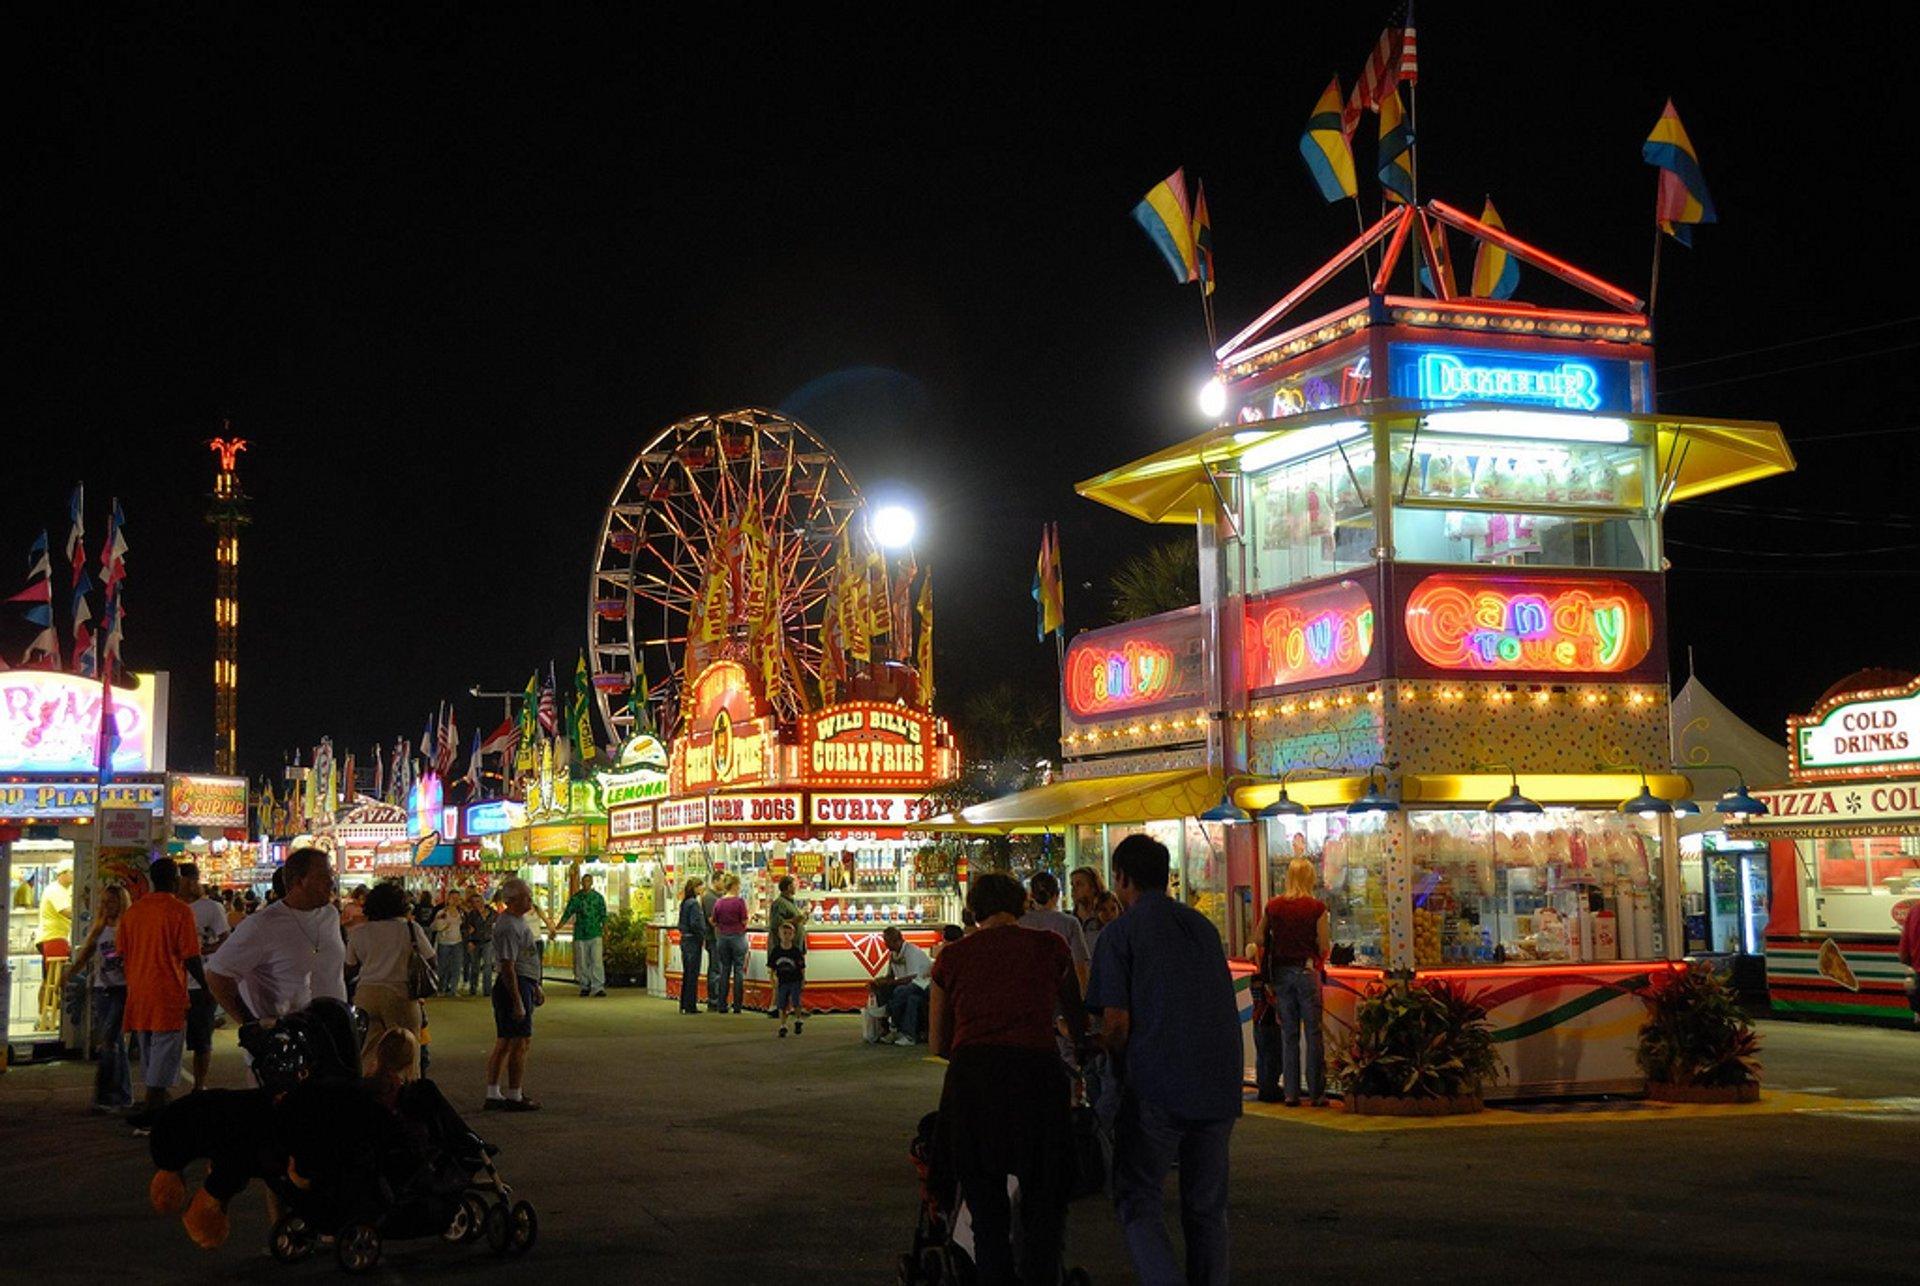 South Florida Fair 2021 - Dates & Map With South Florida Fair 2021